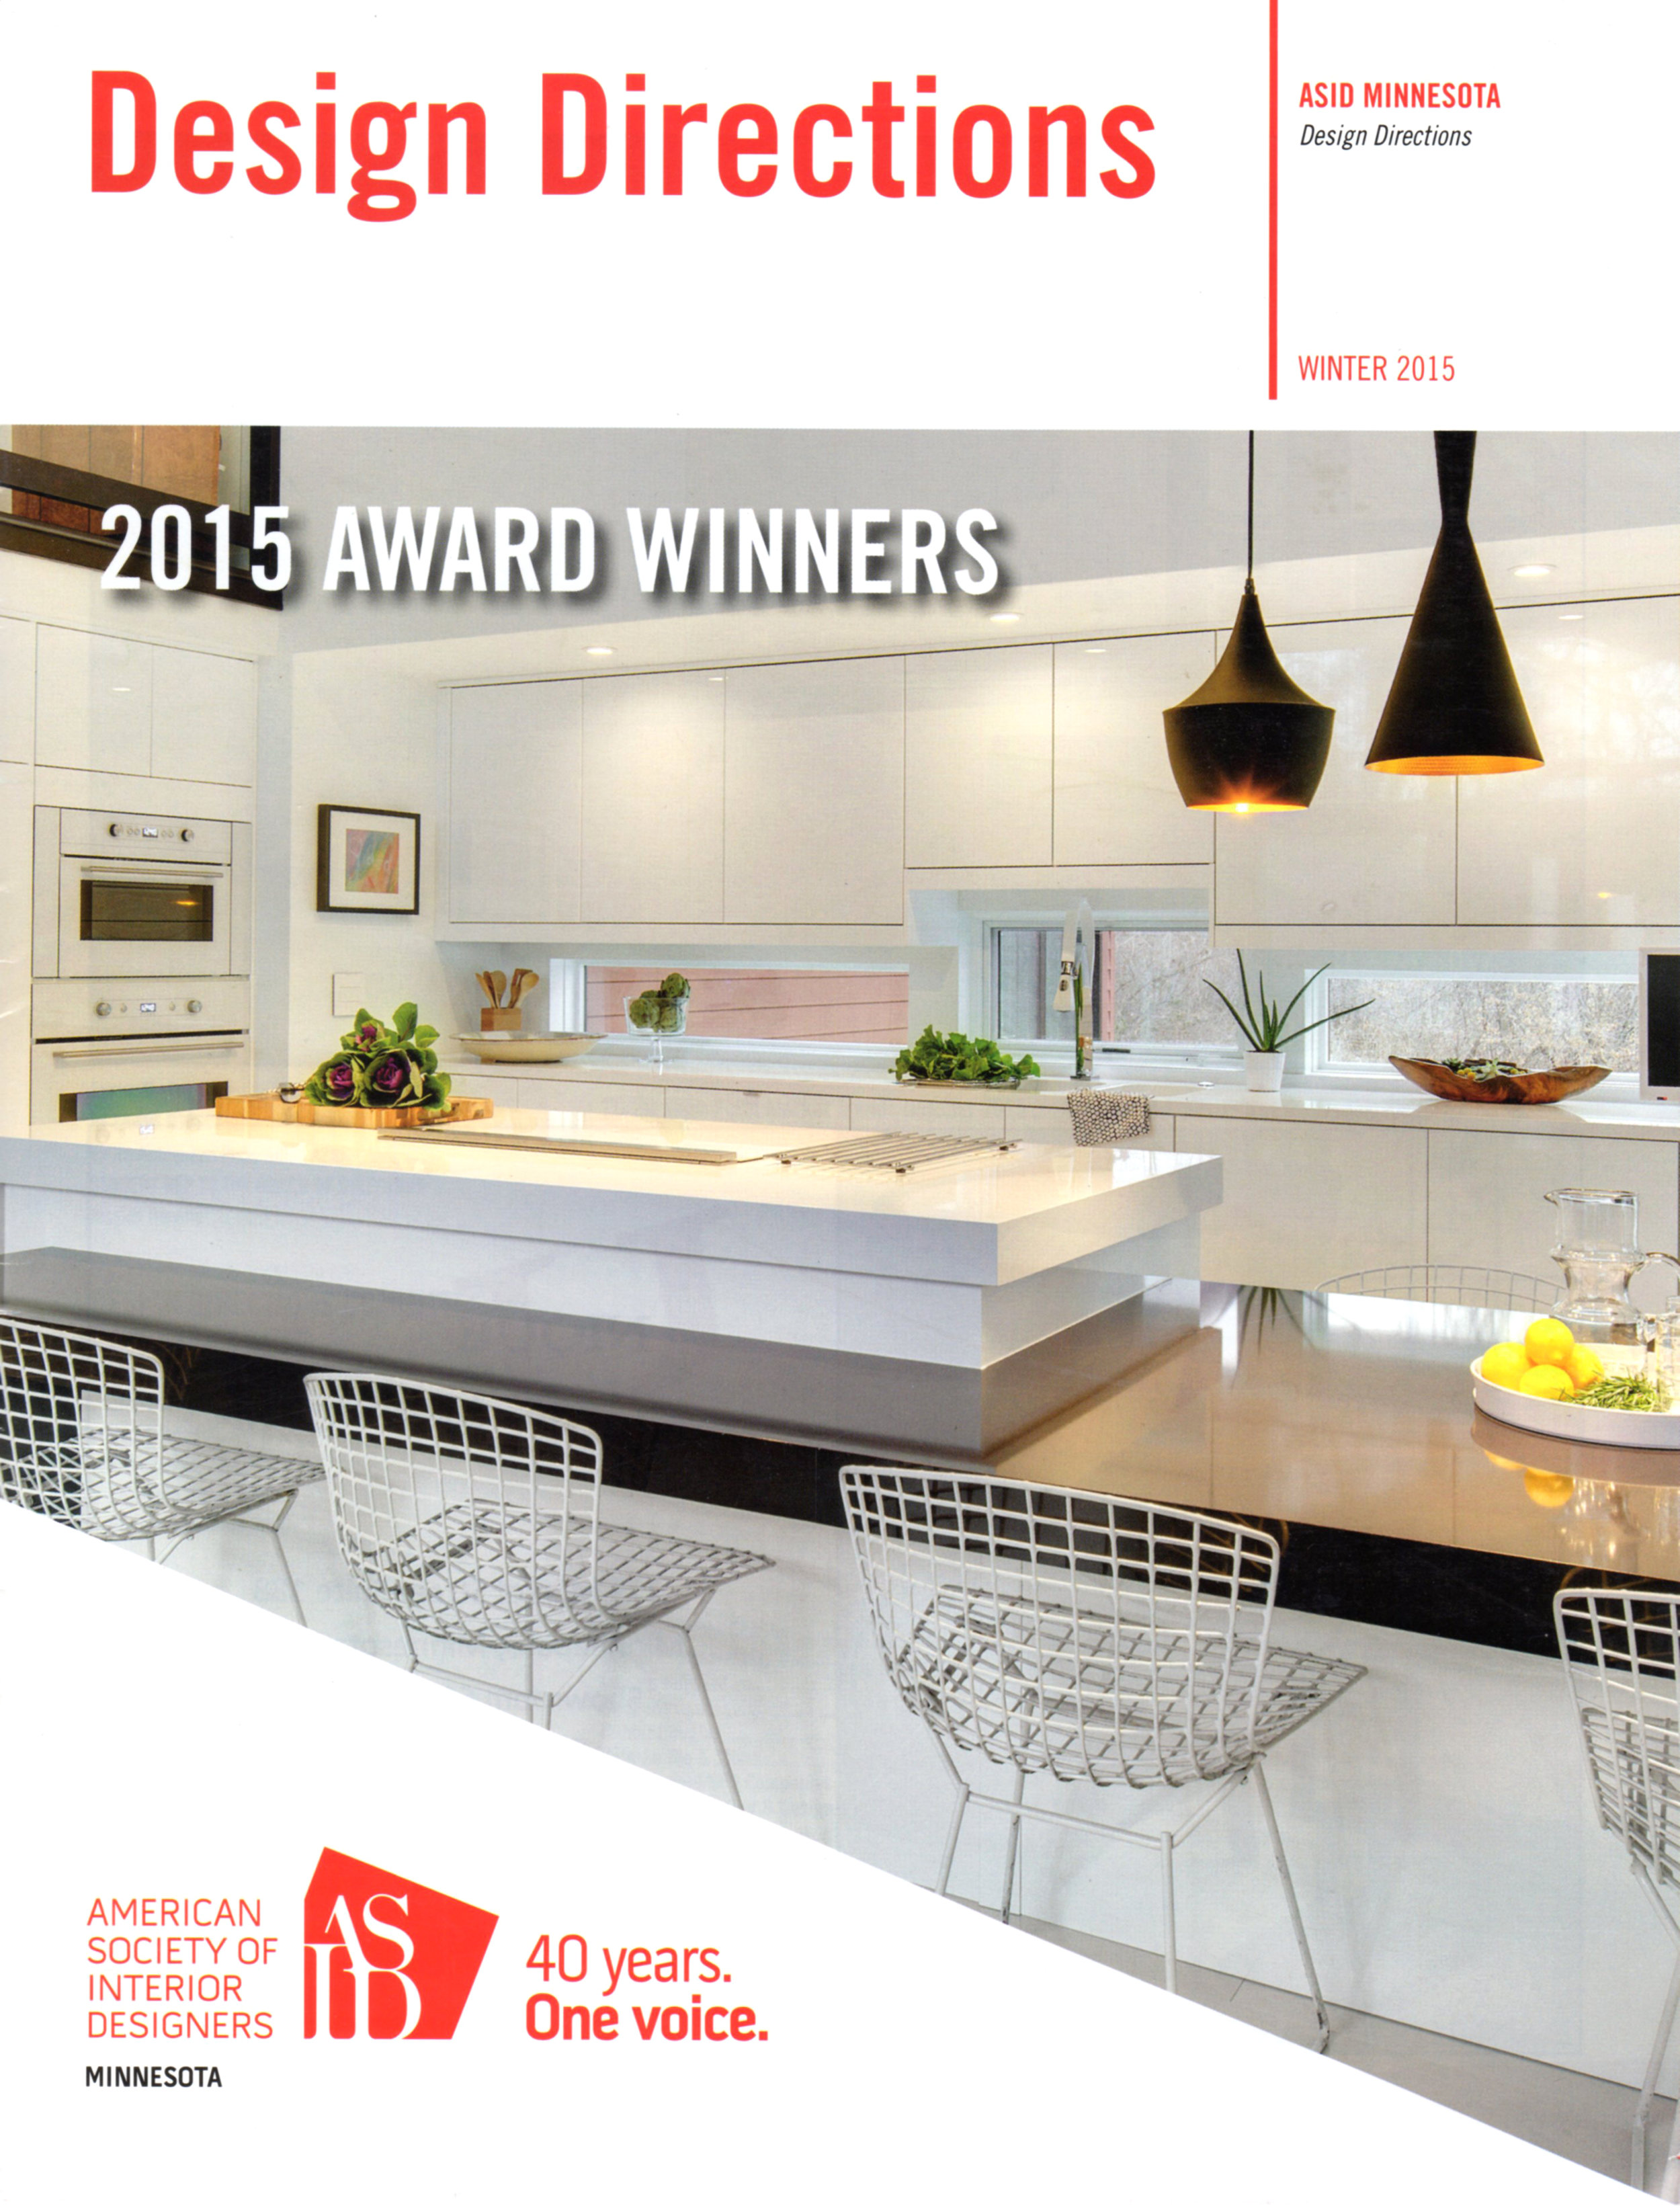 Design-Directions-2015.jpg